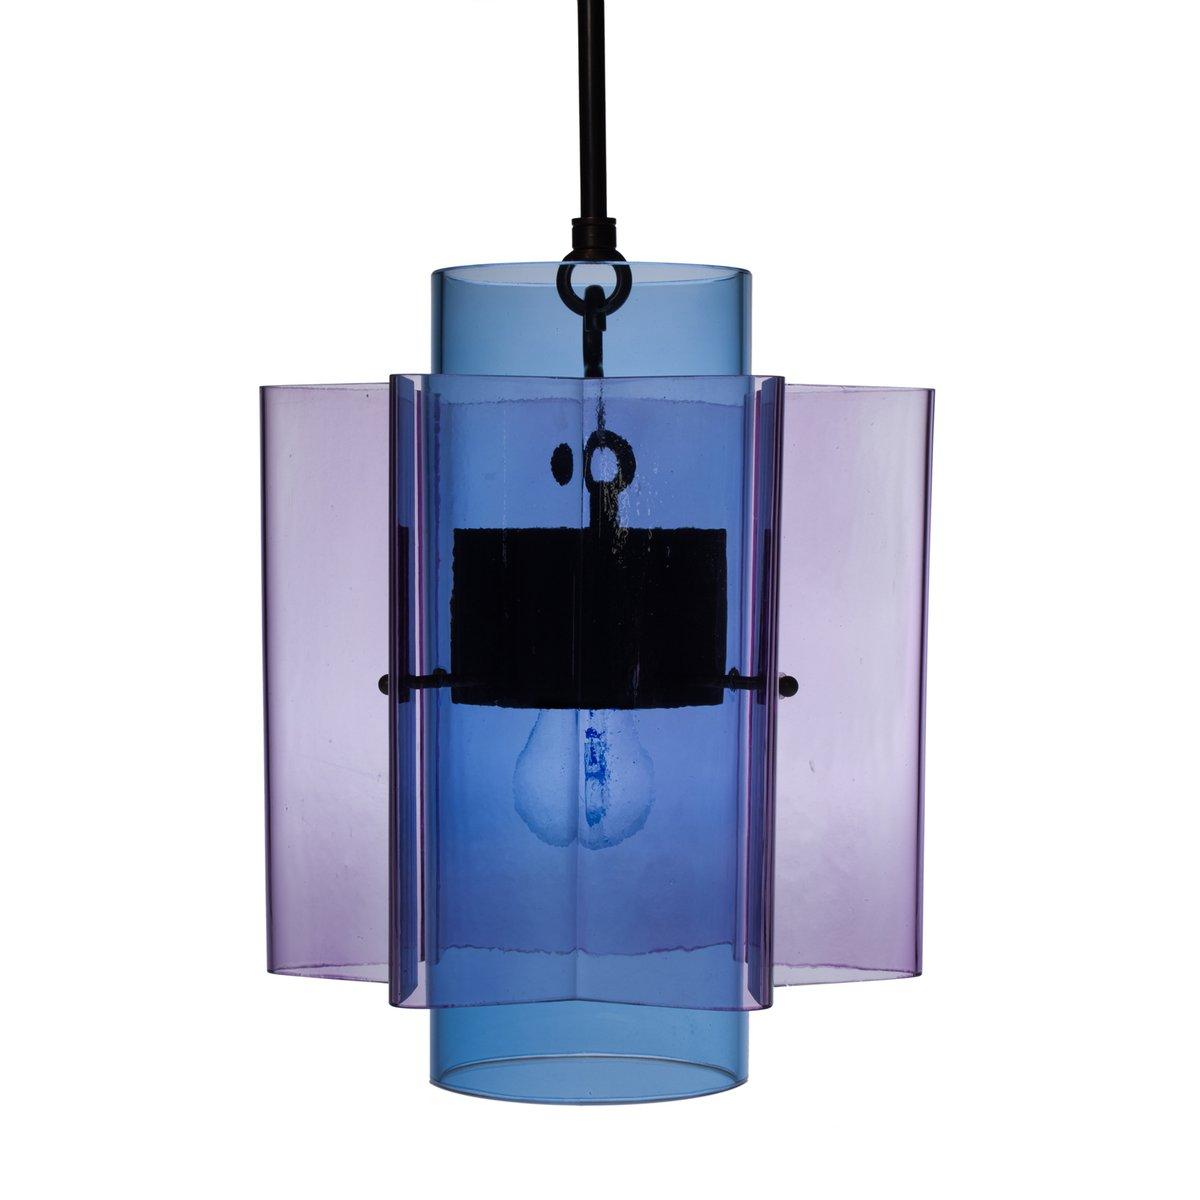 Petrona star shaped pendant light in purple and blue mouthblown petrona star shaped pendant light in purple and blue mouthblown glass by fredjuul aloadofball Choice Image